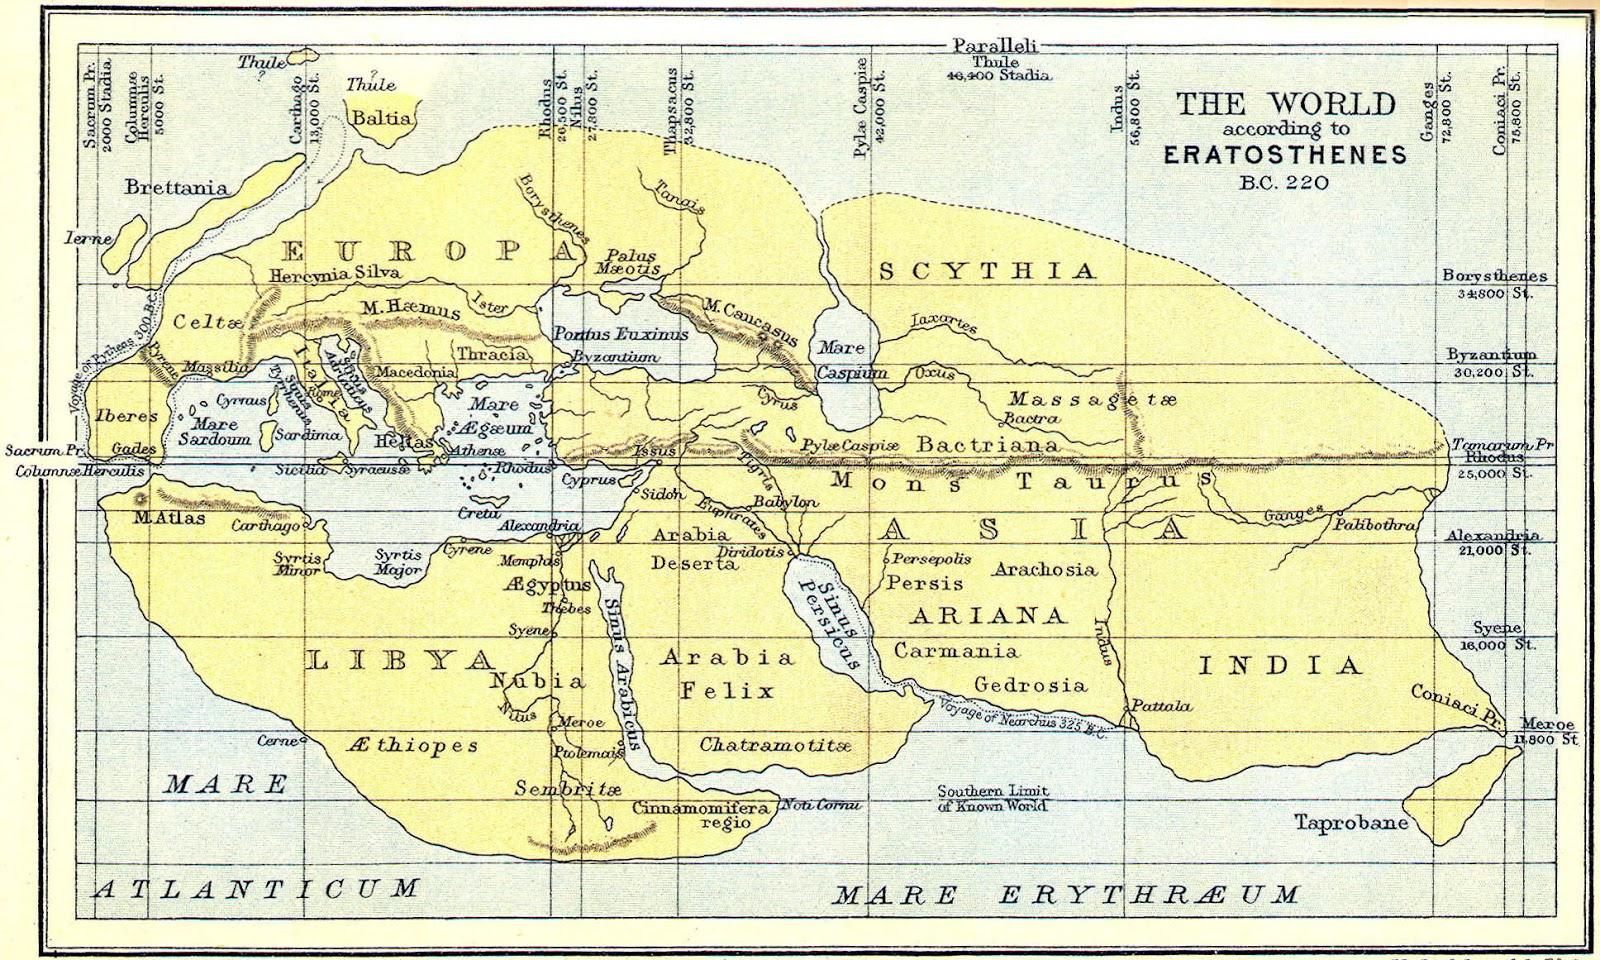 The World according to Eratosthenes (BC 220)